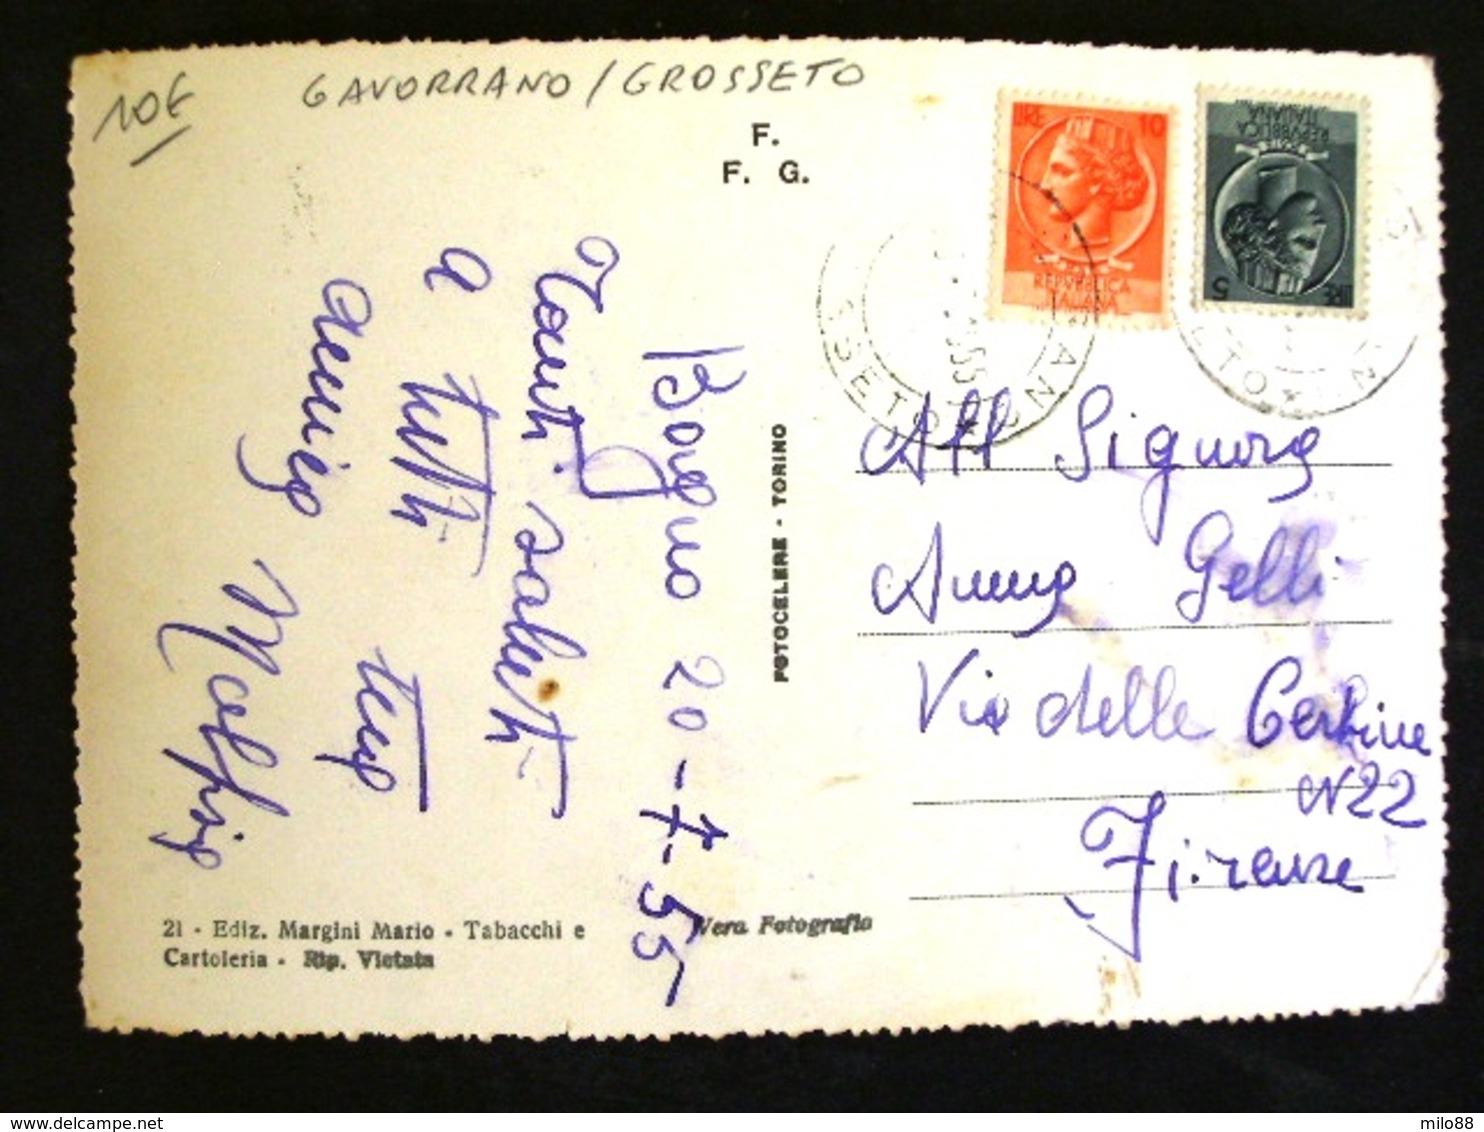 TOSCANA -GROSSETO -GAVORRANO -F.G. LOTTO N°22 - Grosseto